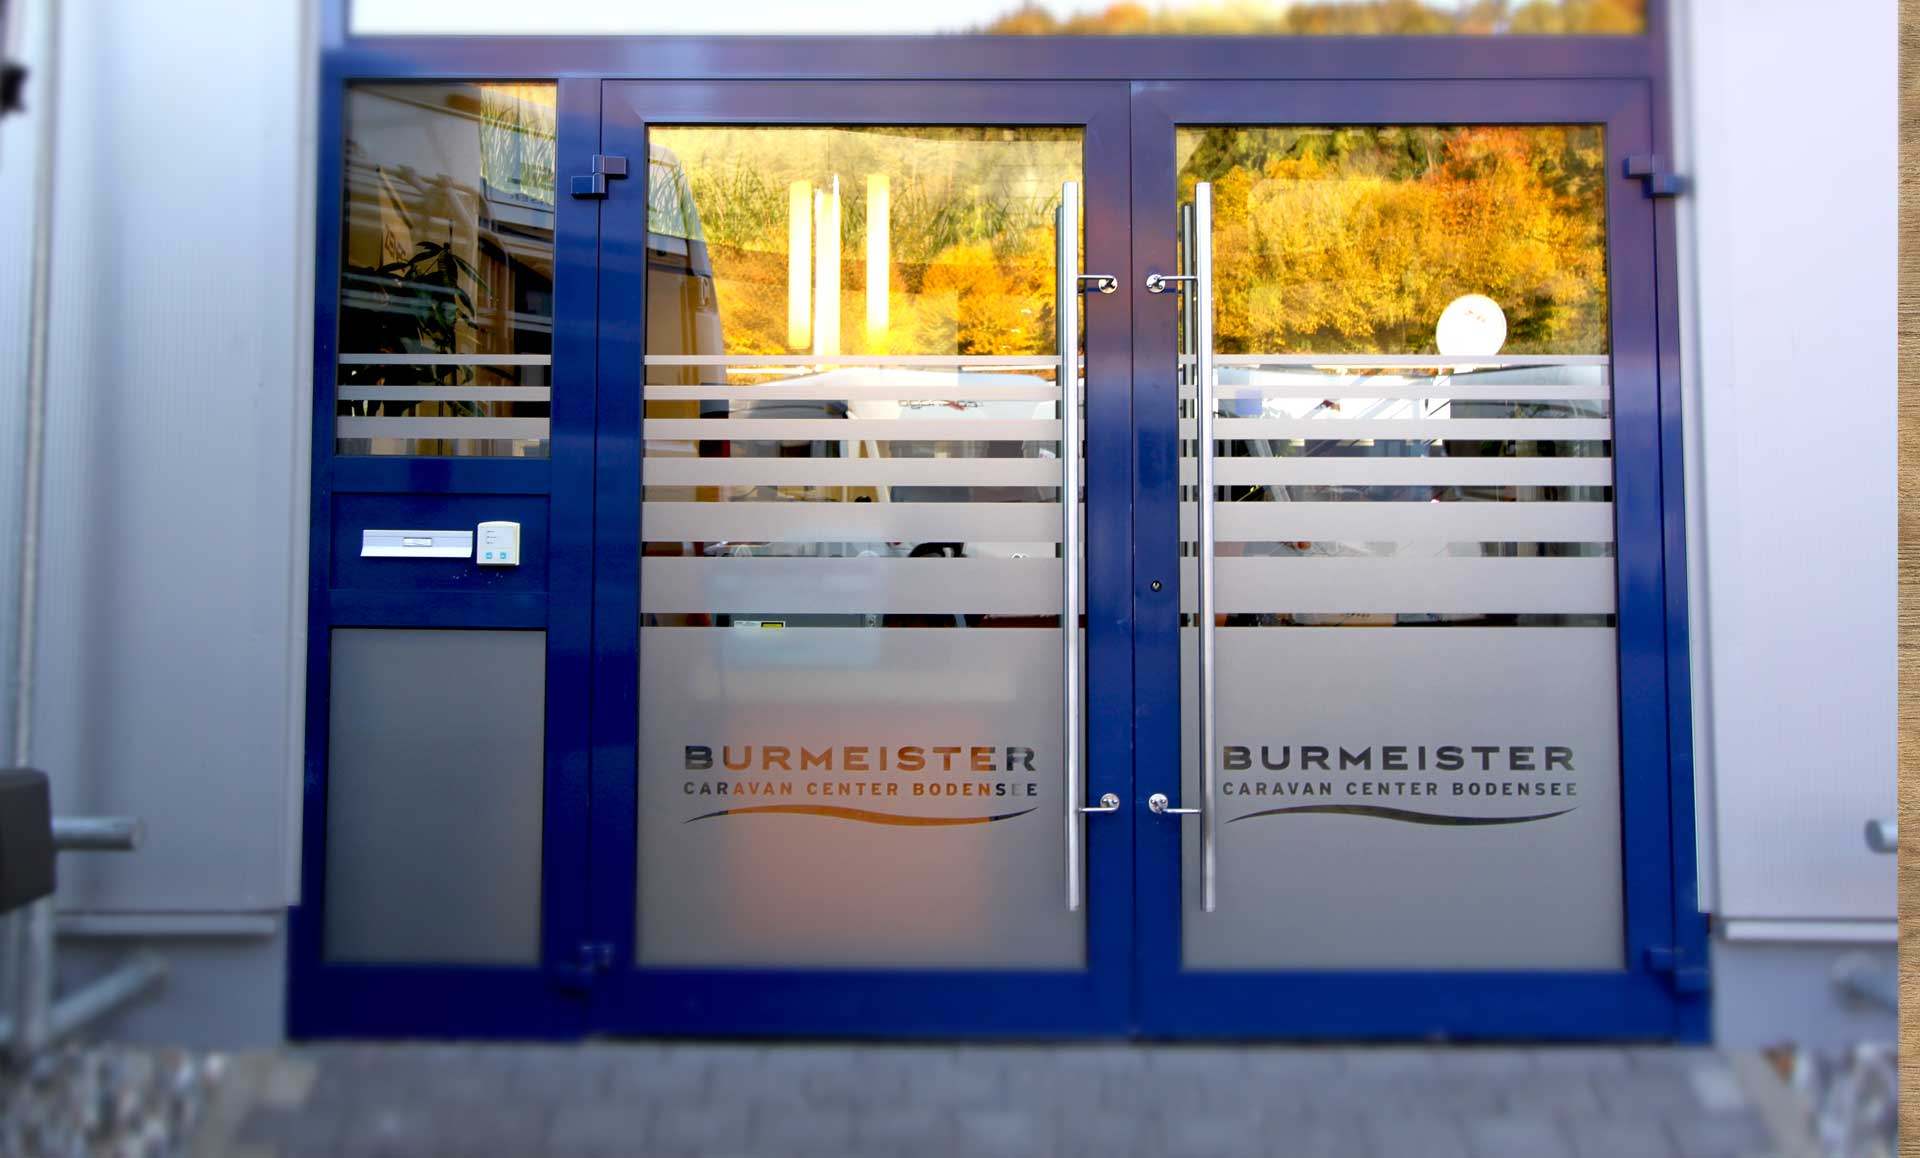 Beklebung Burmeister